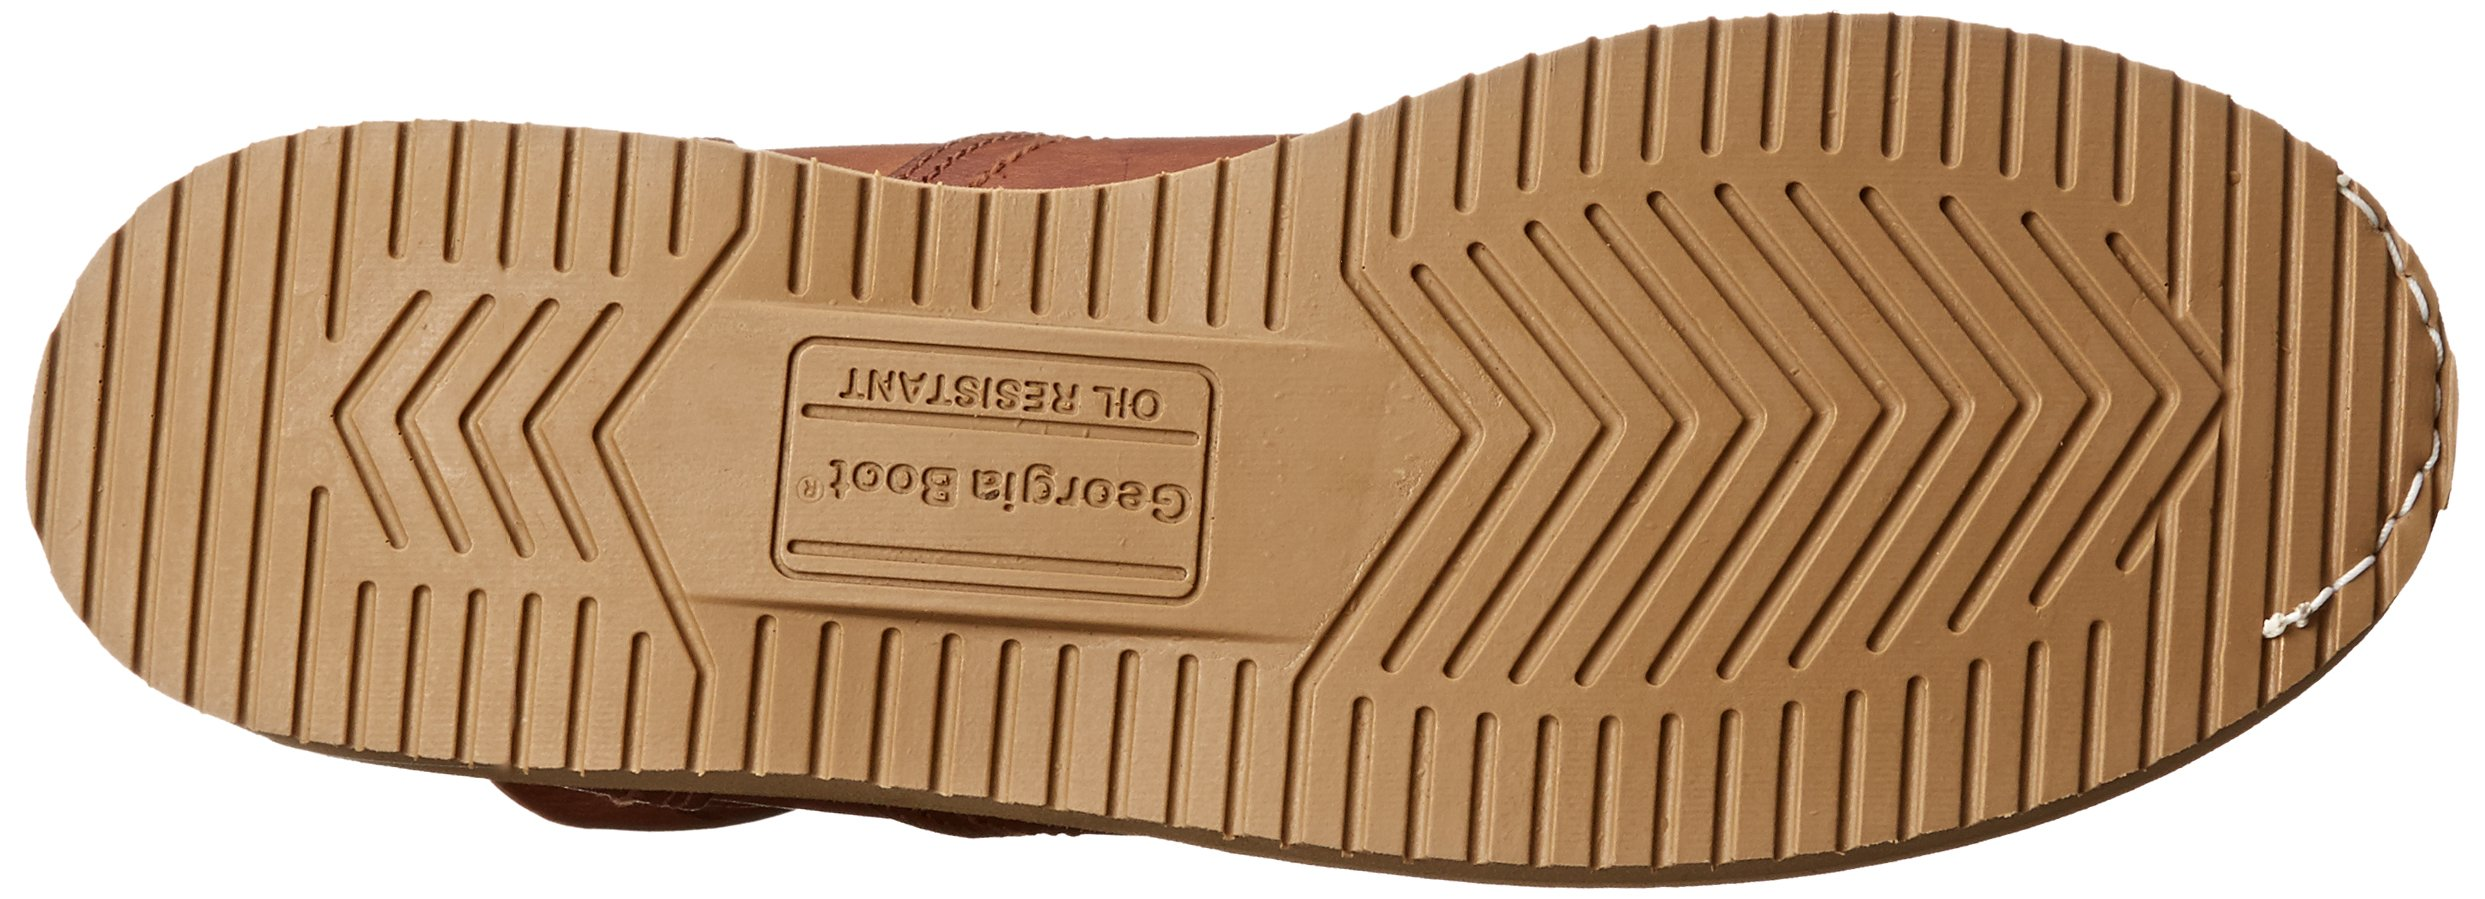 Georgia Boot Men's 8 Inch Wedge Work Shoe, Barracuda Gold, 12 W US by Georgia (Image #3)